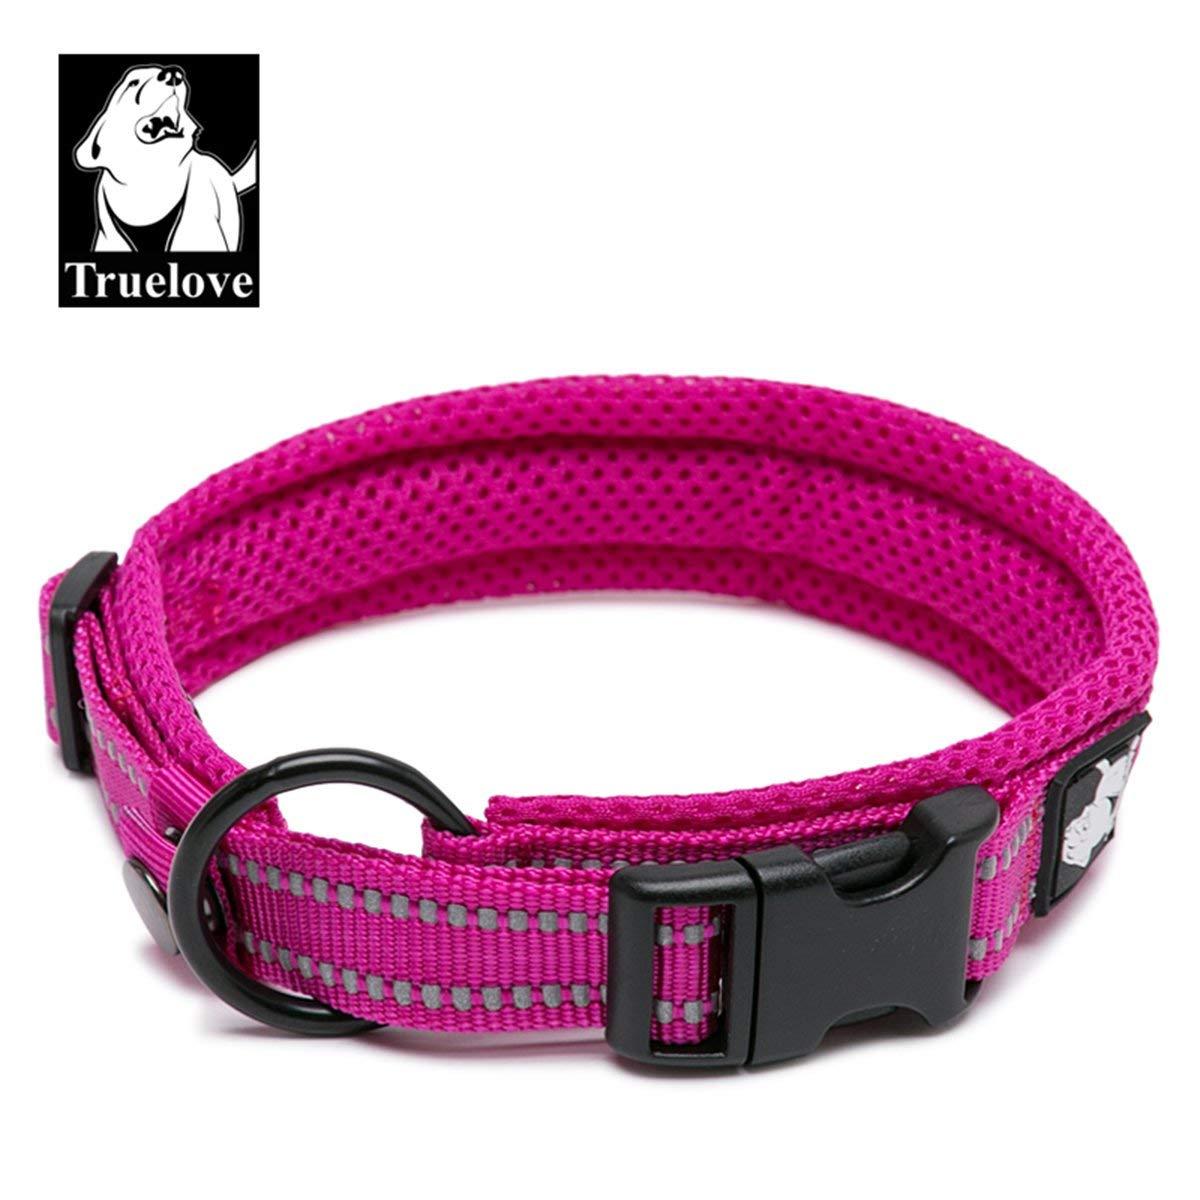 Truelove Dog Training Collar TLC5011 Reflective Premium Duraflex Buckle,High Grade Nylon Webbing No Choke Basic Collars Now Available